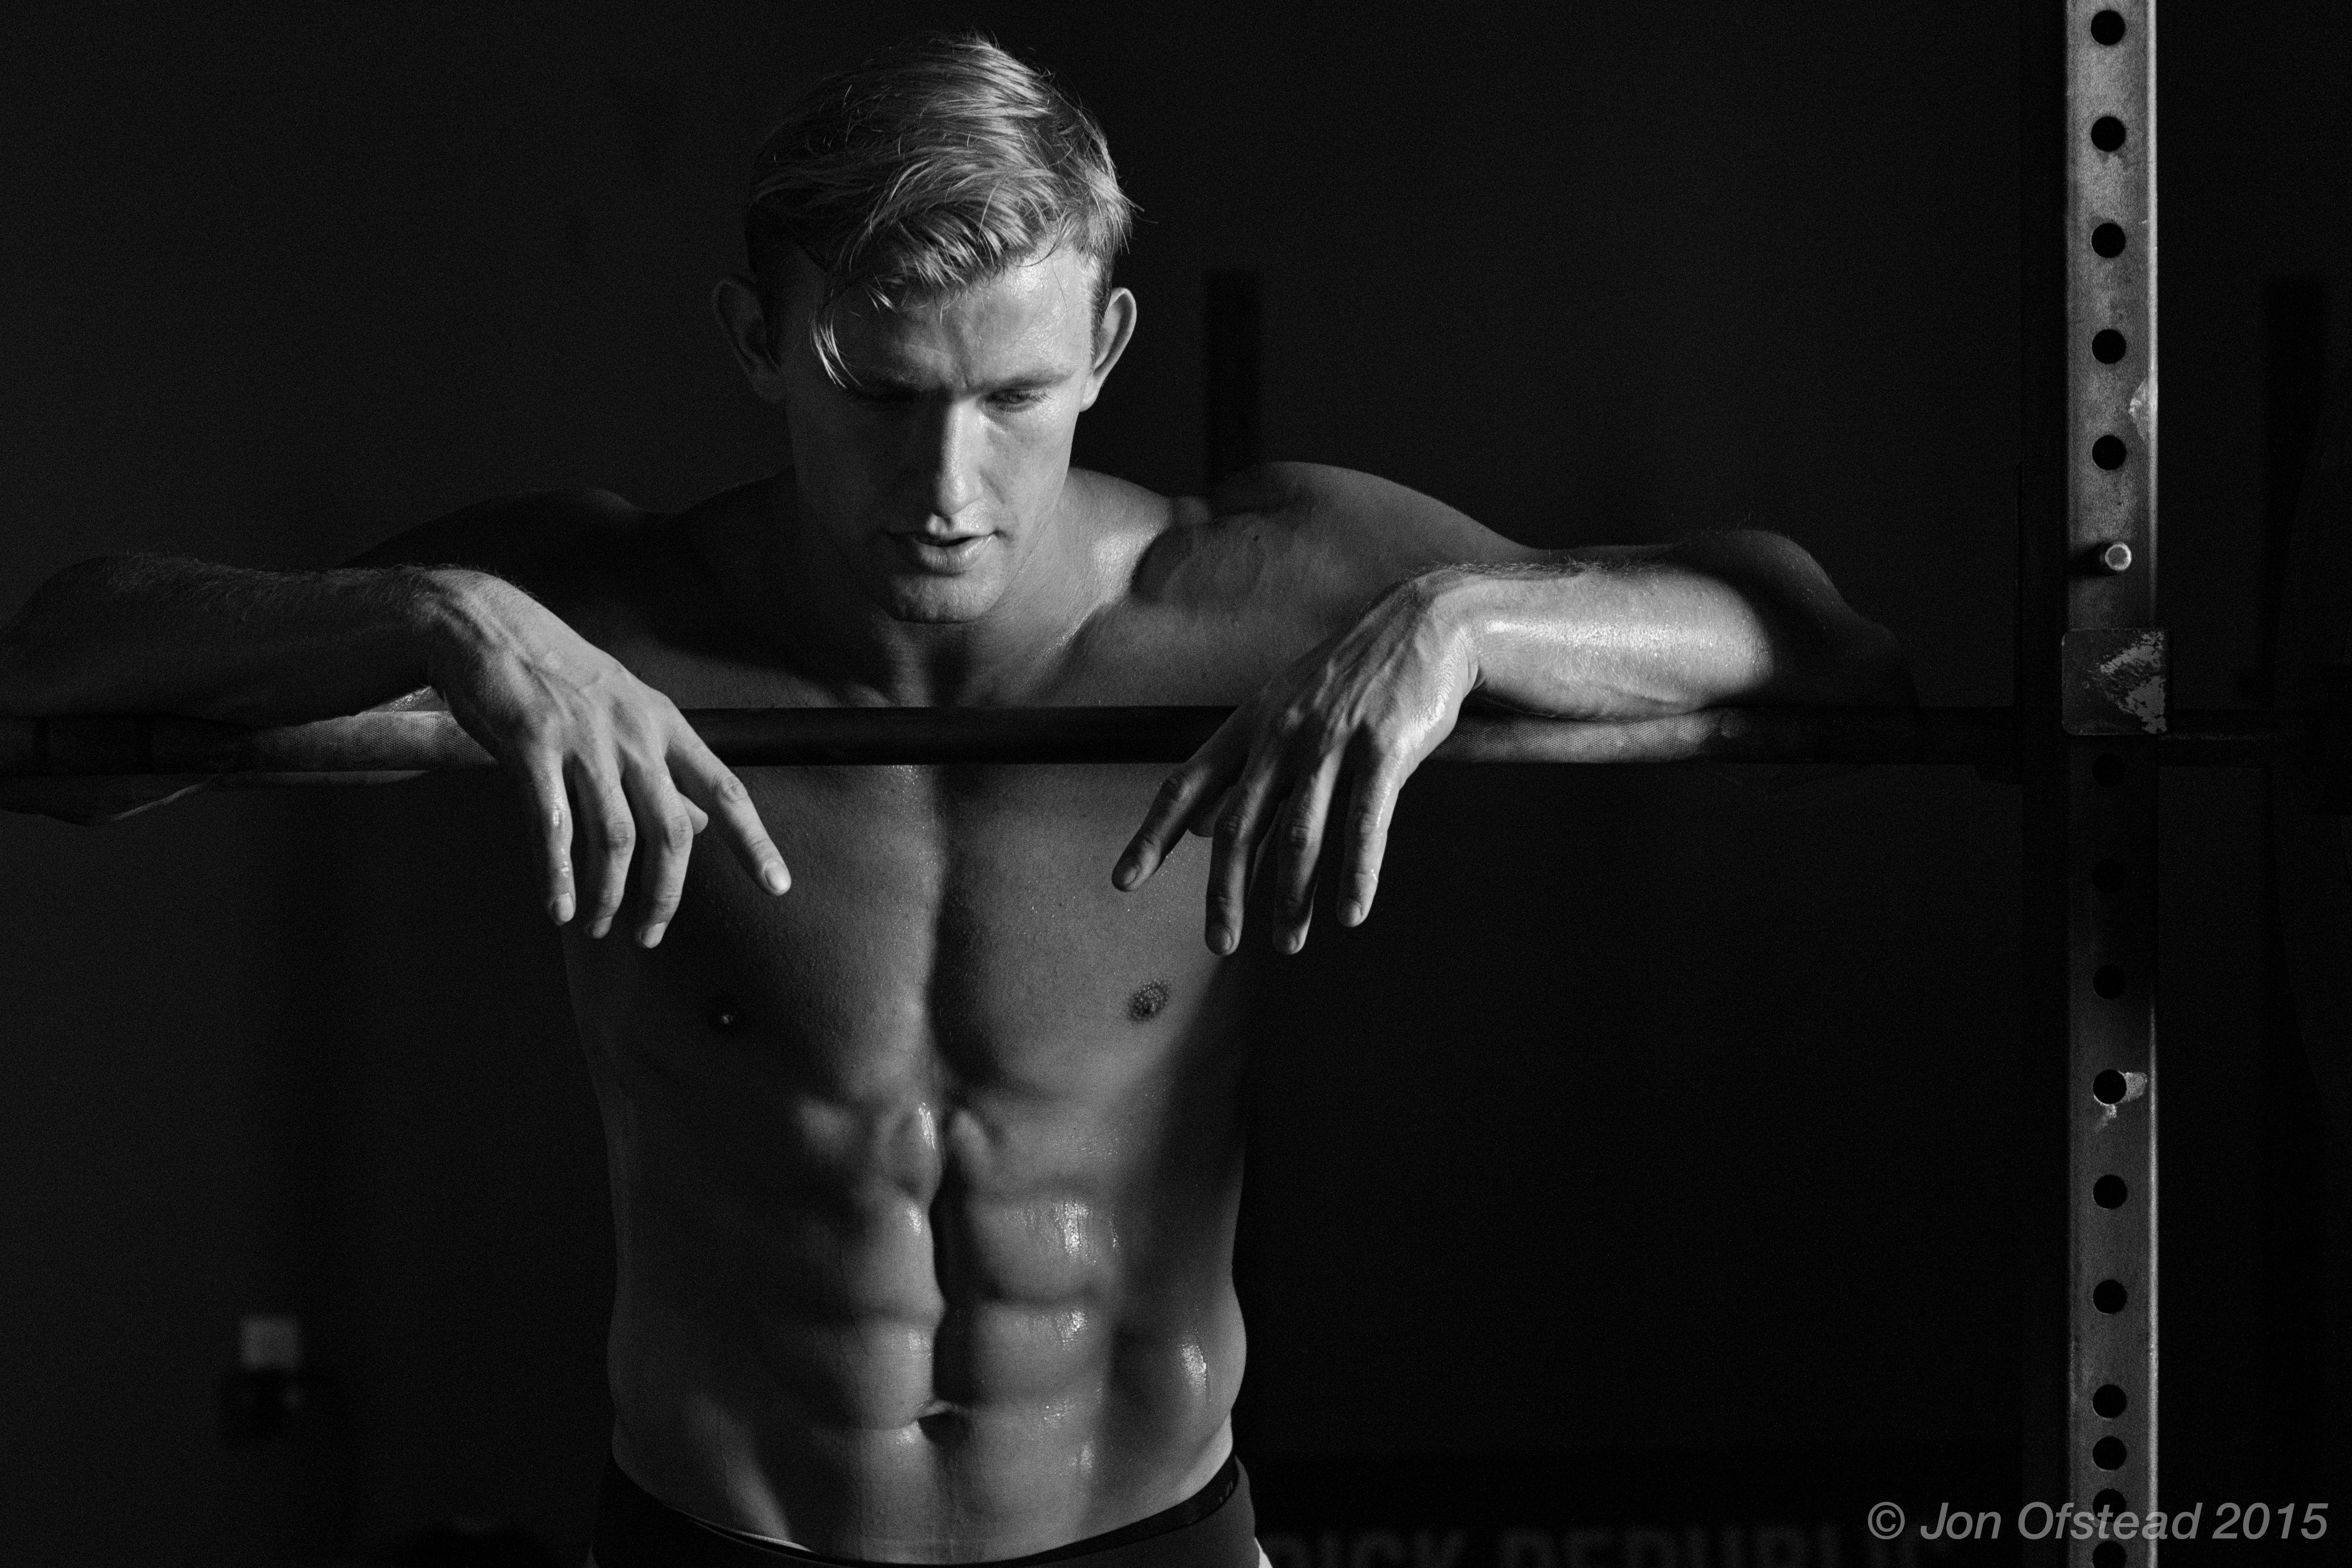 athlete and actor anton narinskiy shot for elite fitness